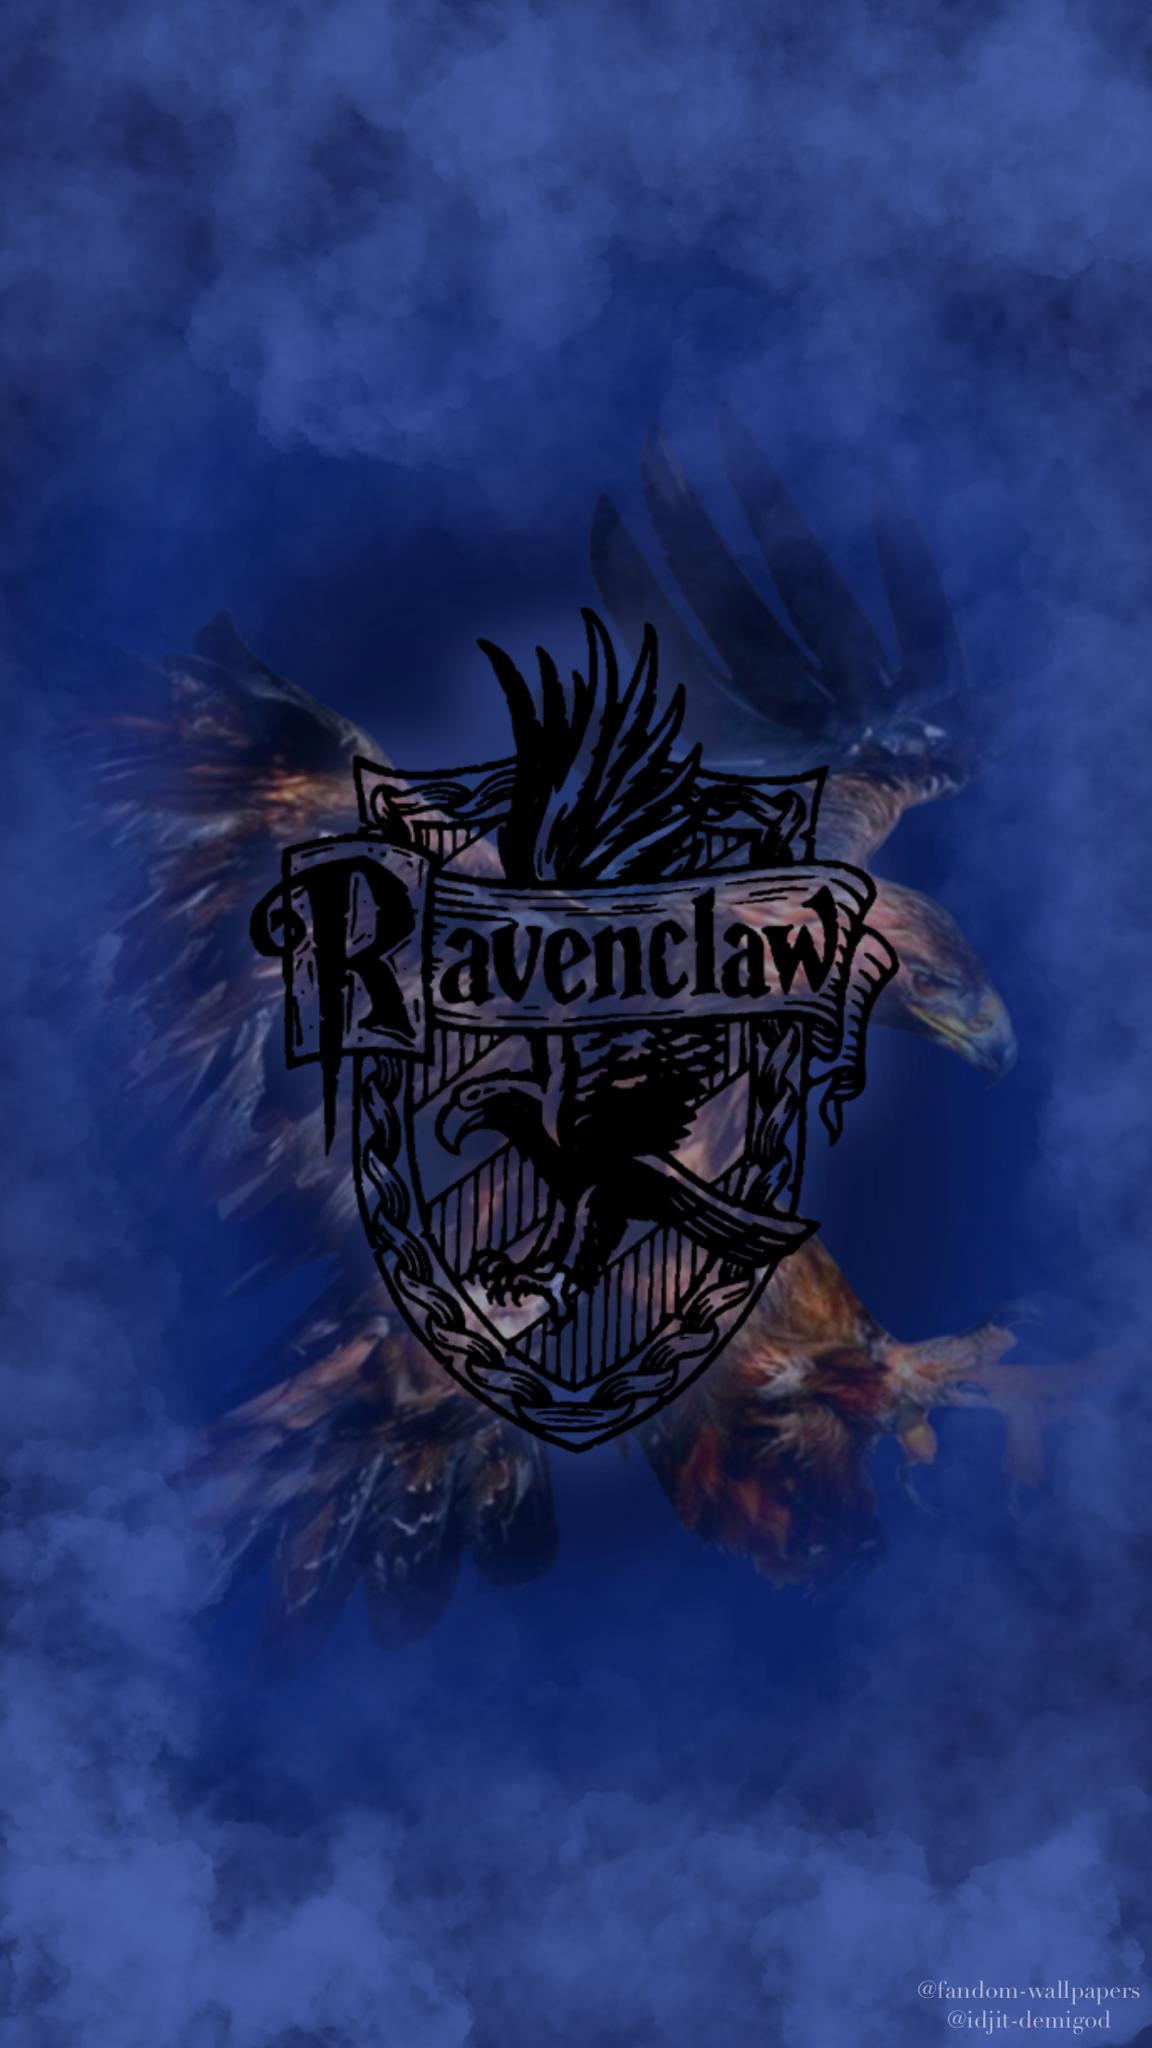 Ravenclaw Harry Potter Wallpaper Harry Potter Background Ravenclaw